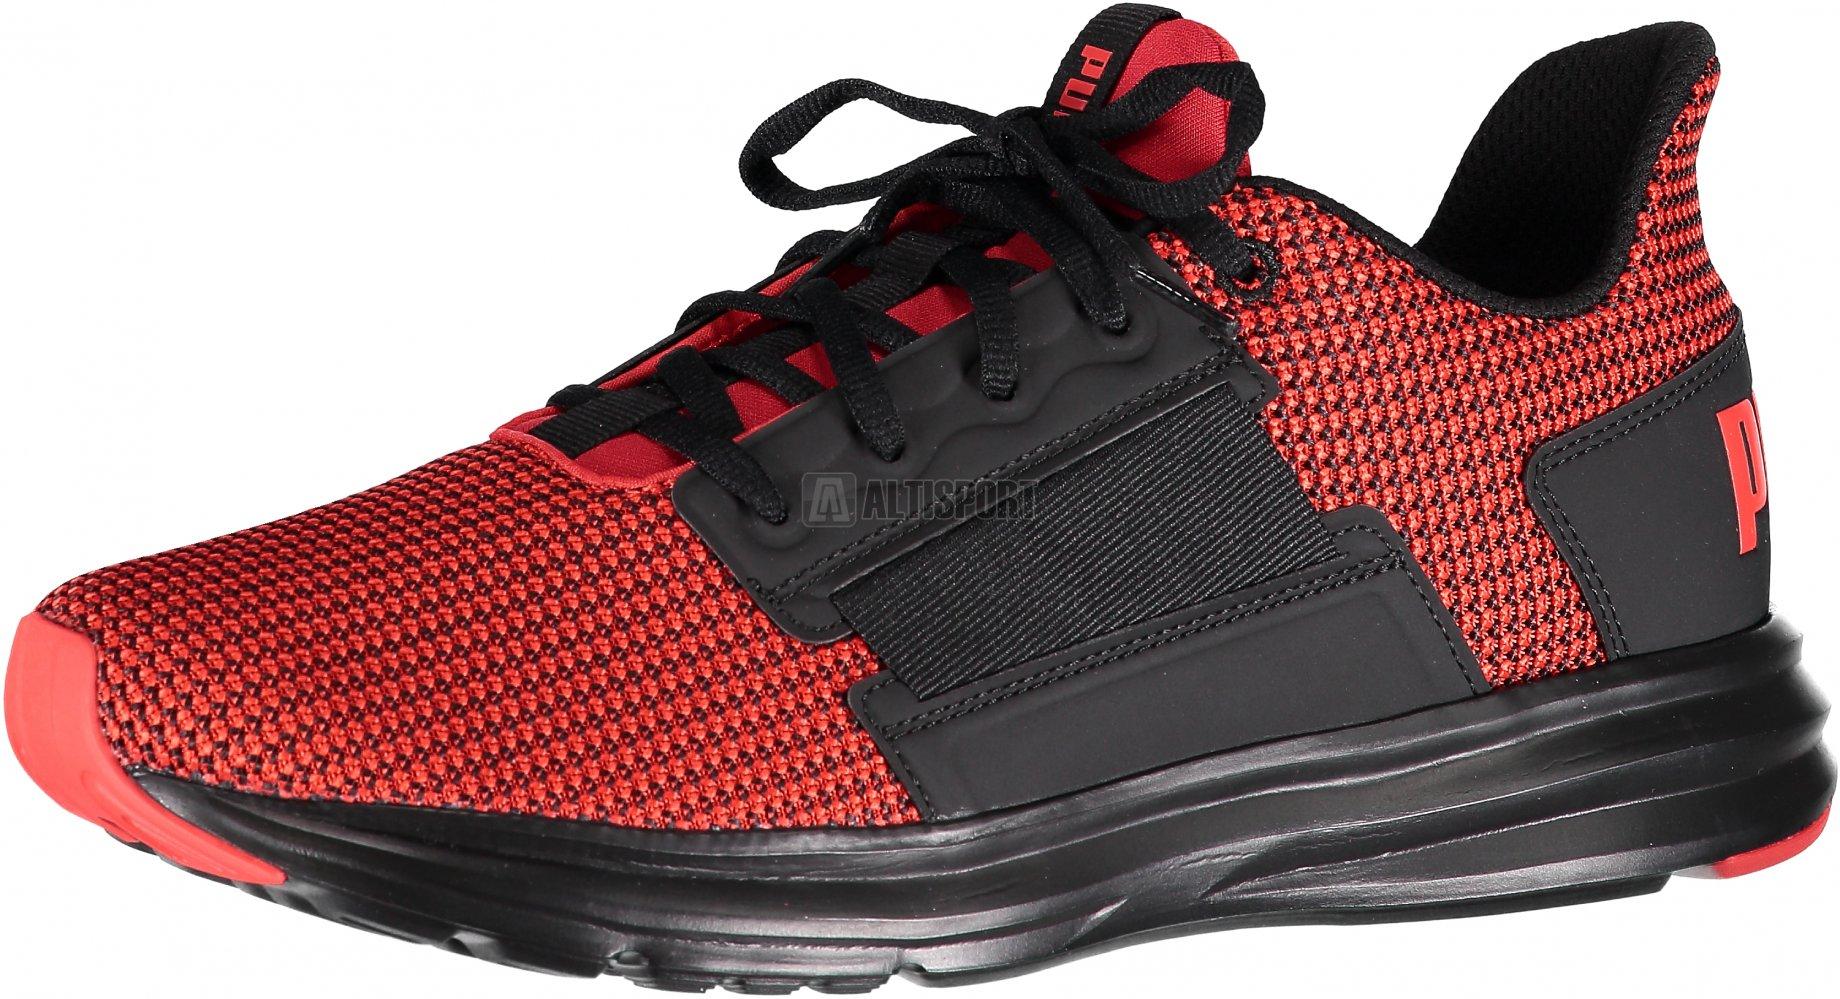 b69c7694c57 Pánská běžecká obuv PUMA ENZO STREET KNIT 19046502 FLAME SCARLET PUMA BLACK